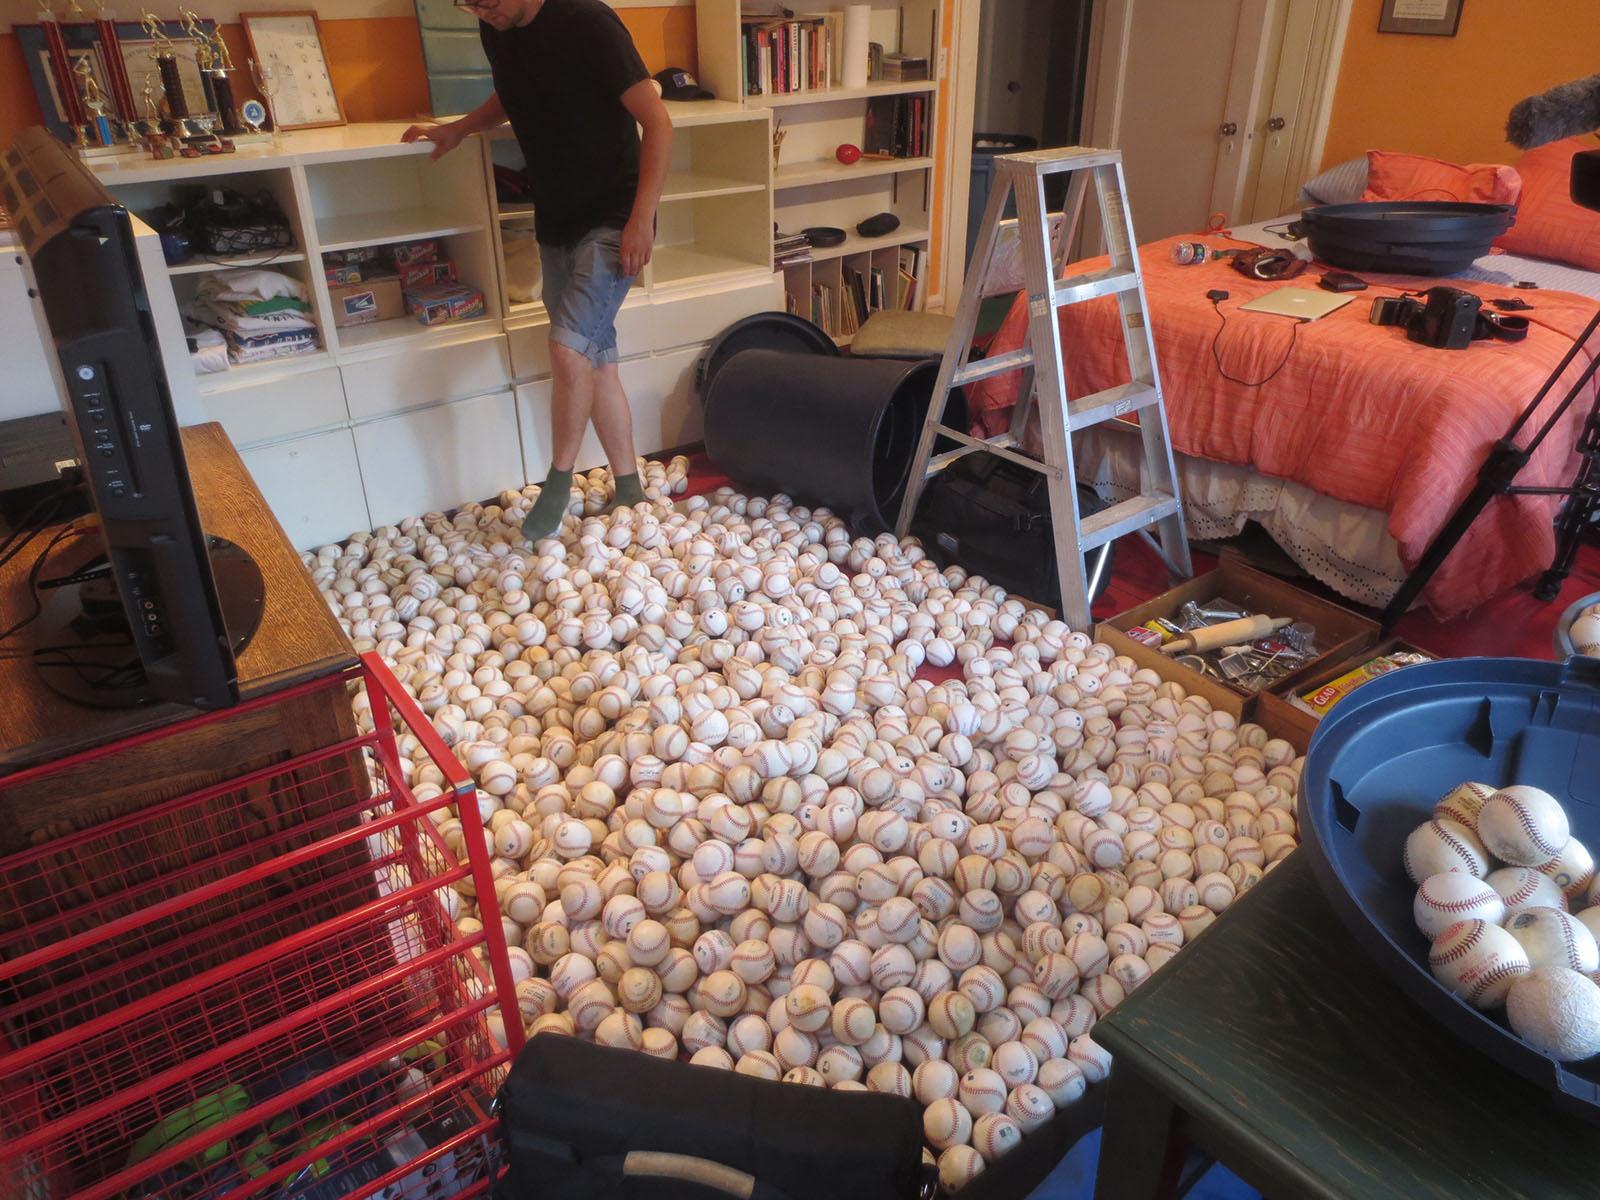 balls_on_floor2.jpg